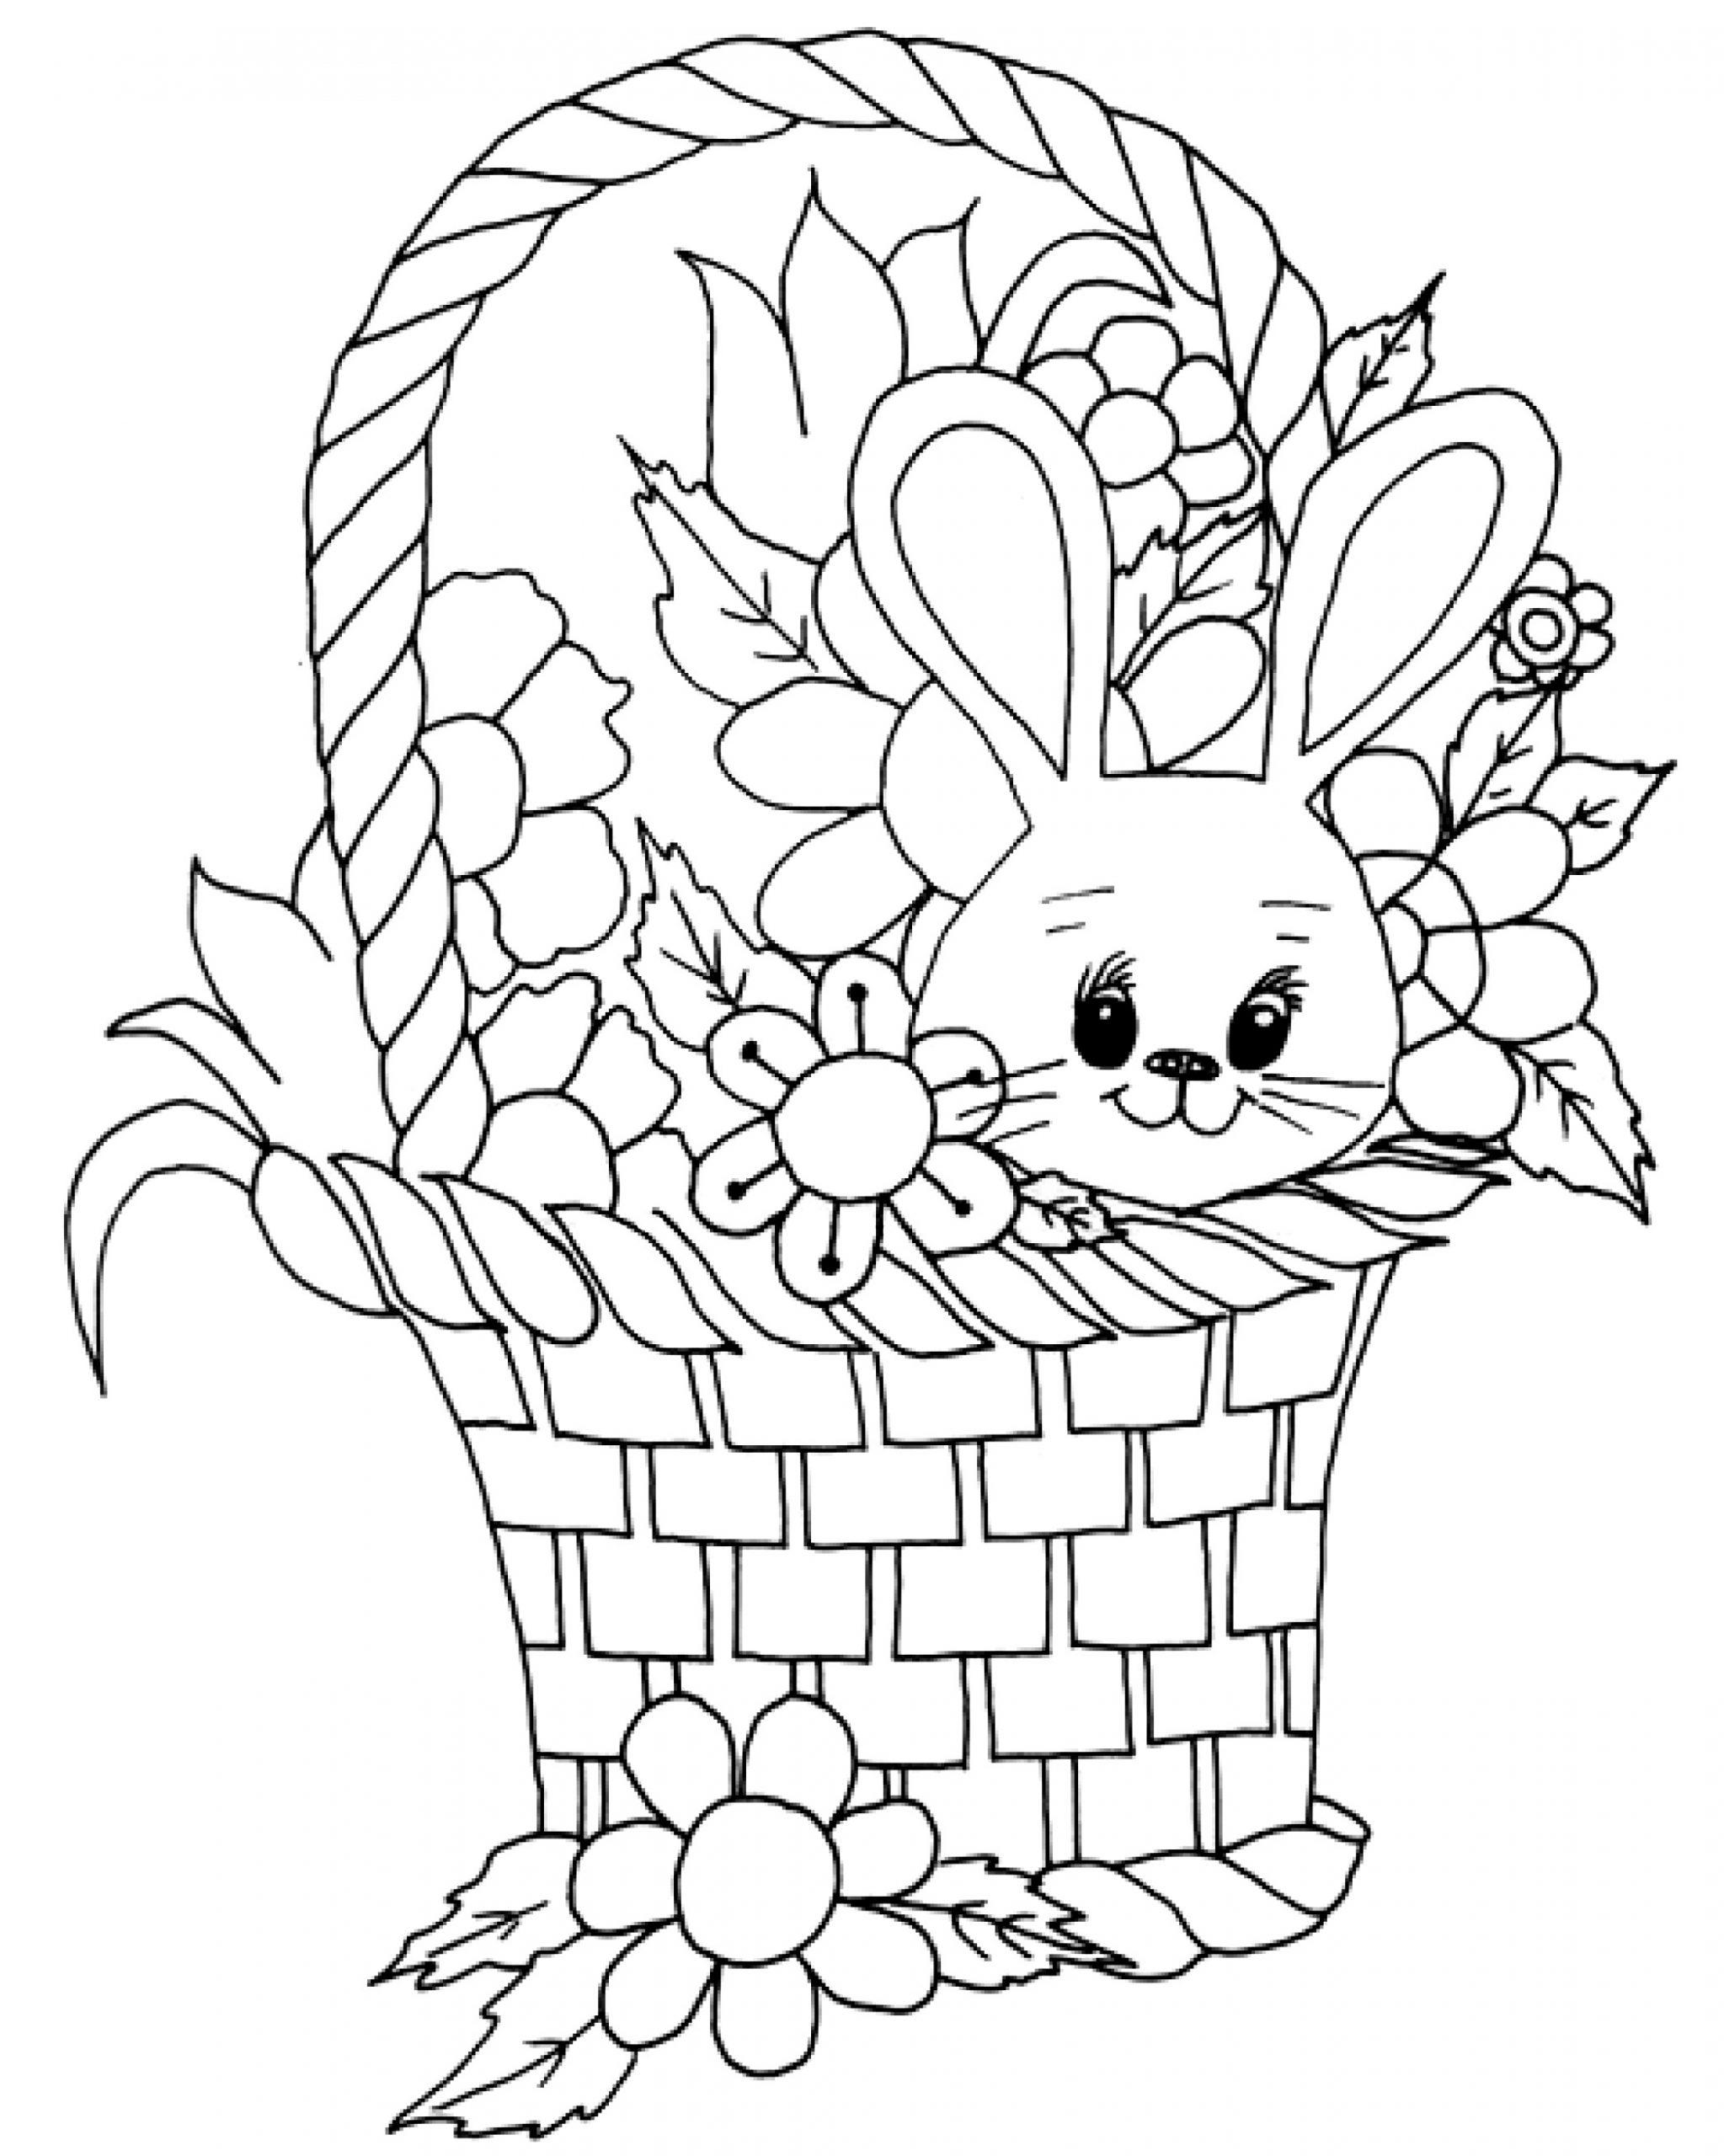 Ausmalbilder Frühling | Mytoys-Blog in Ausmalbilder Frühling